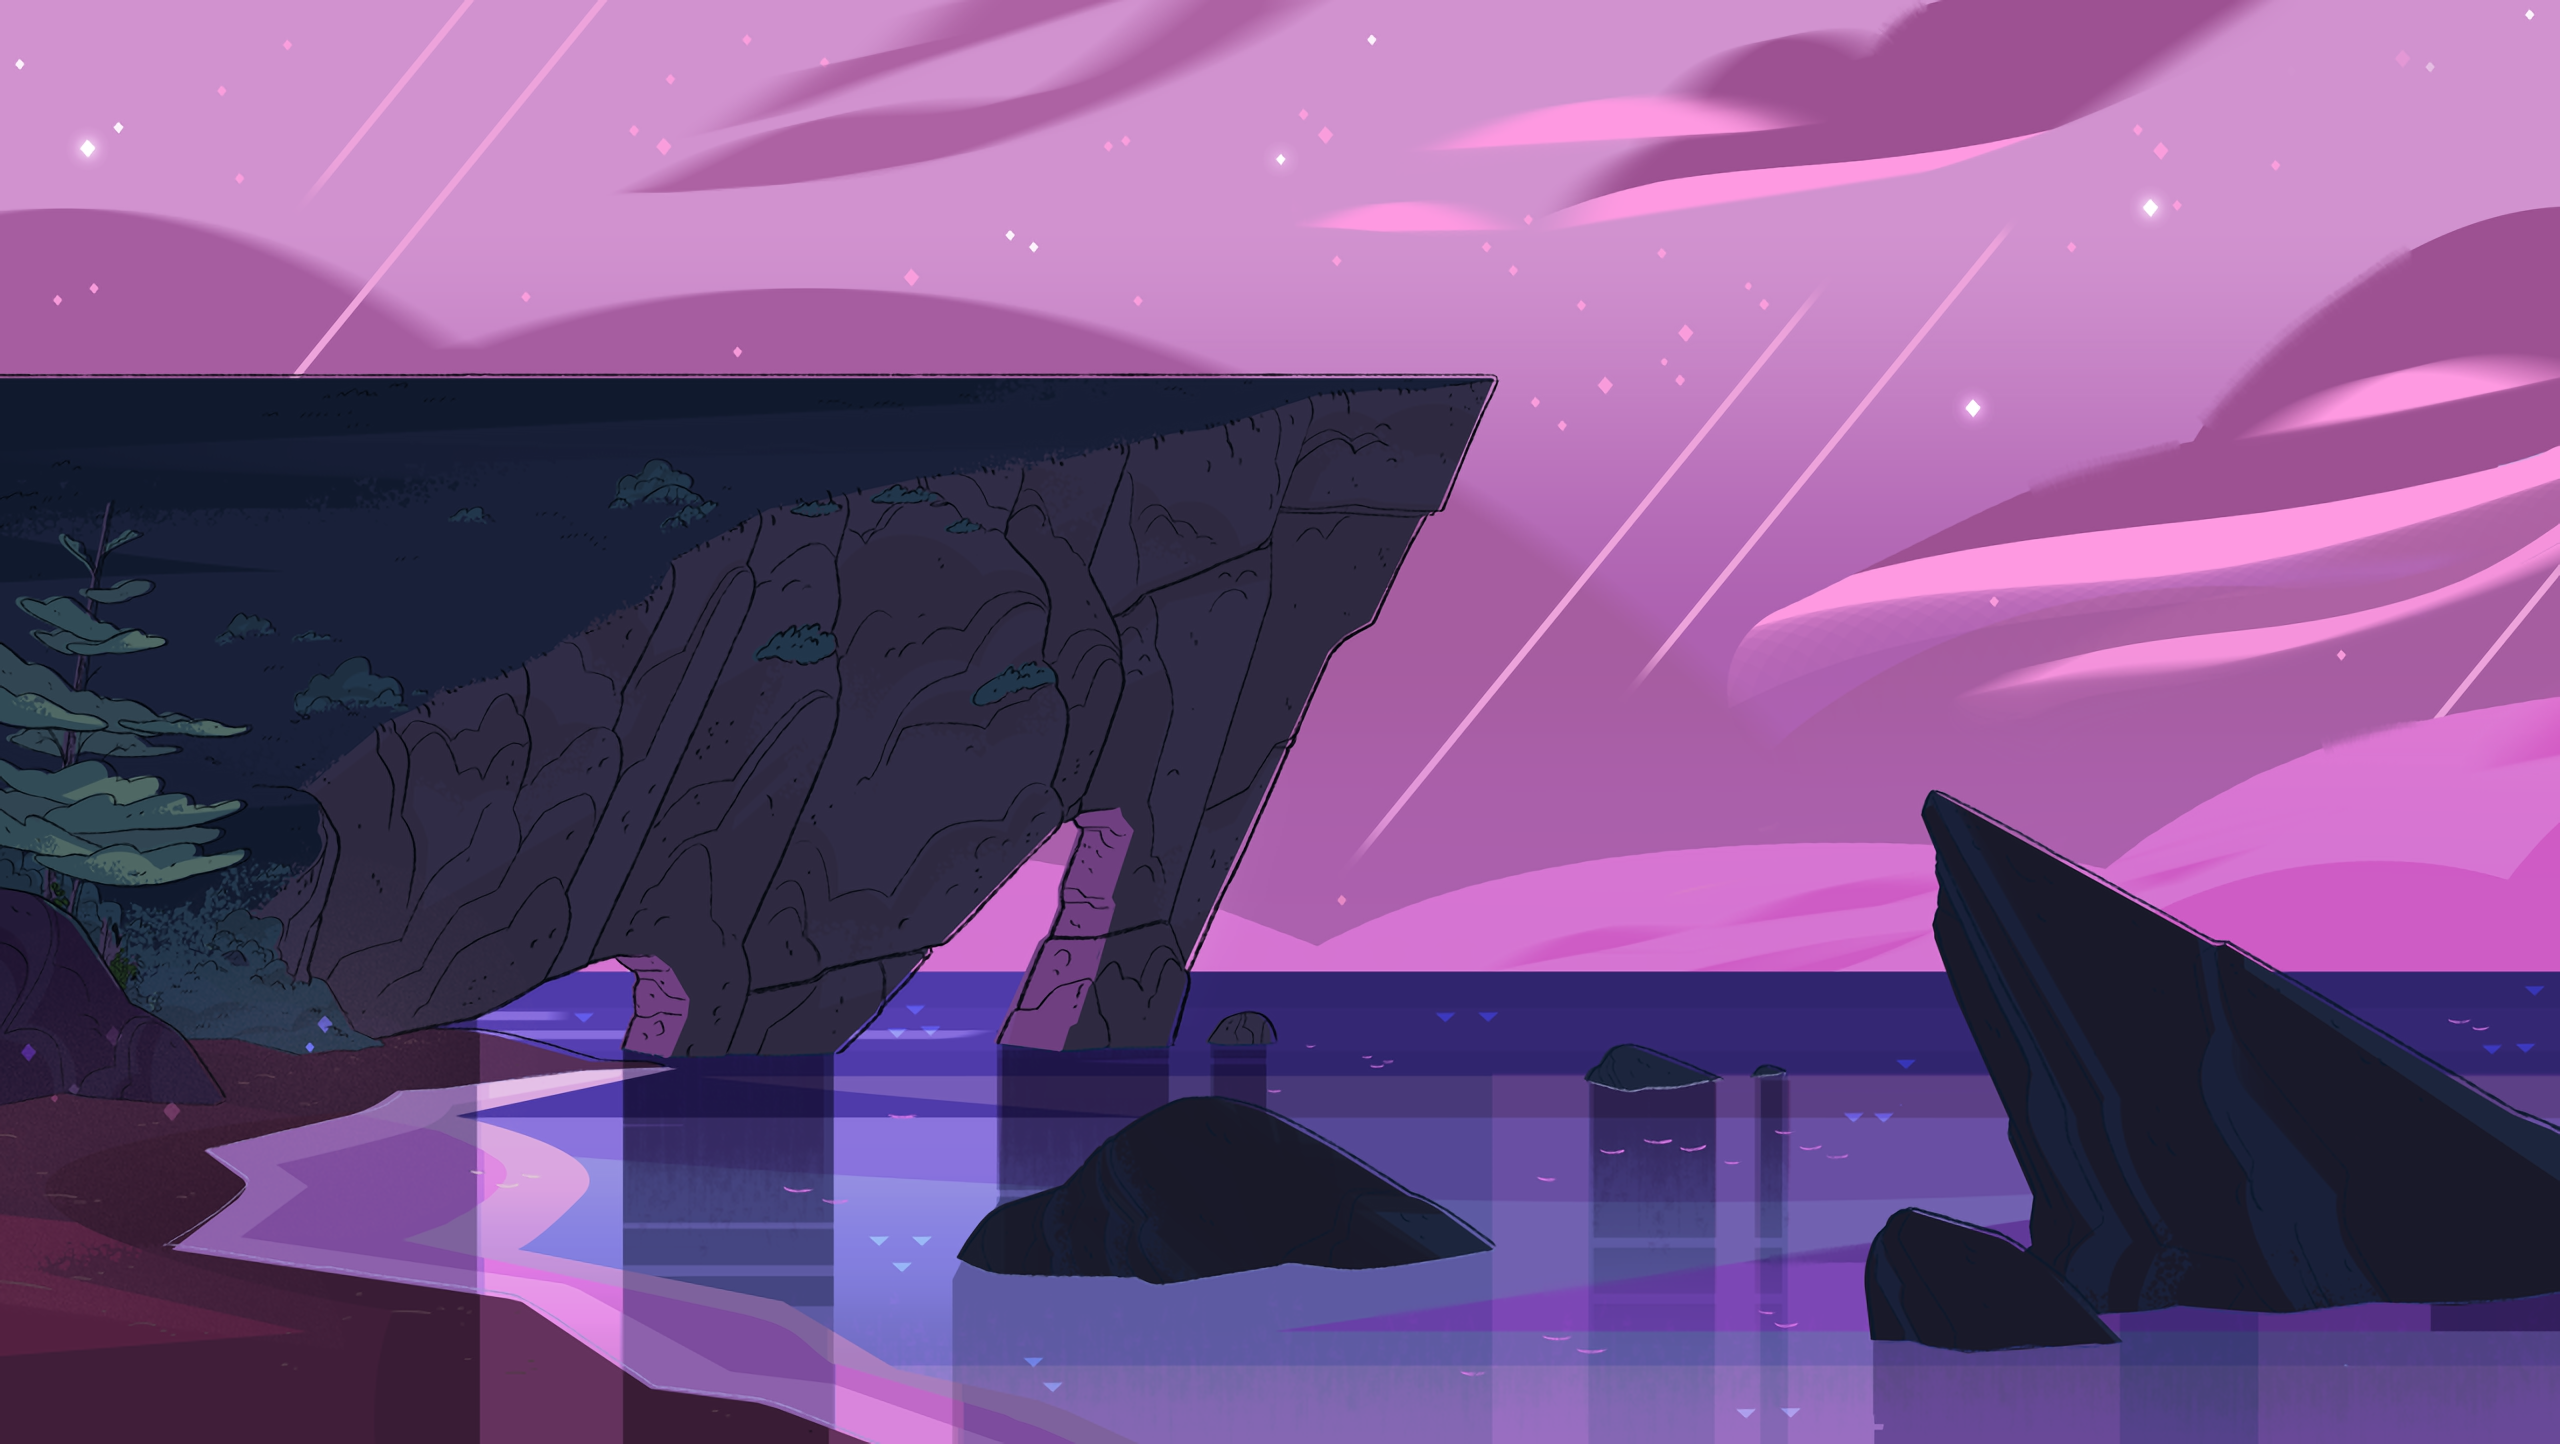 High Res Steven Universe Backgrounds pt. 2